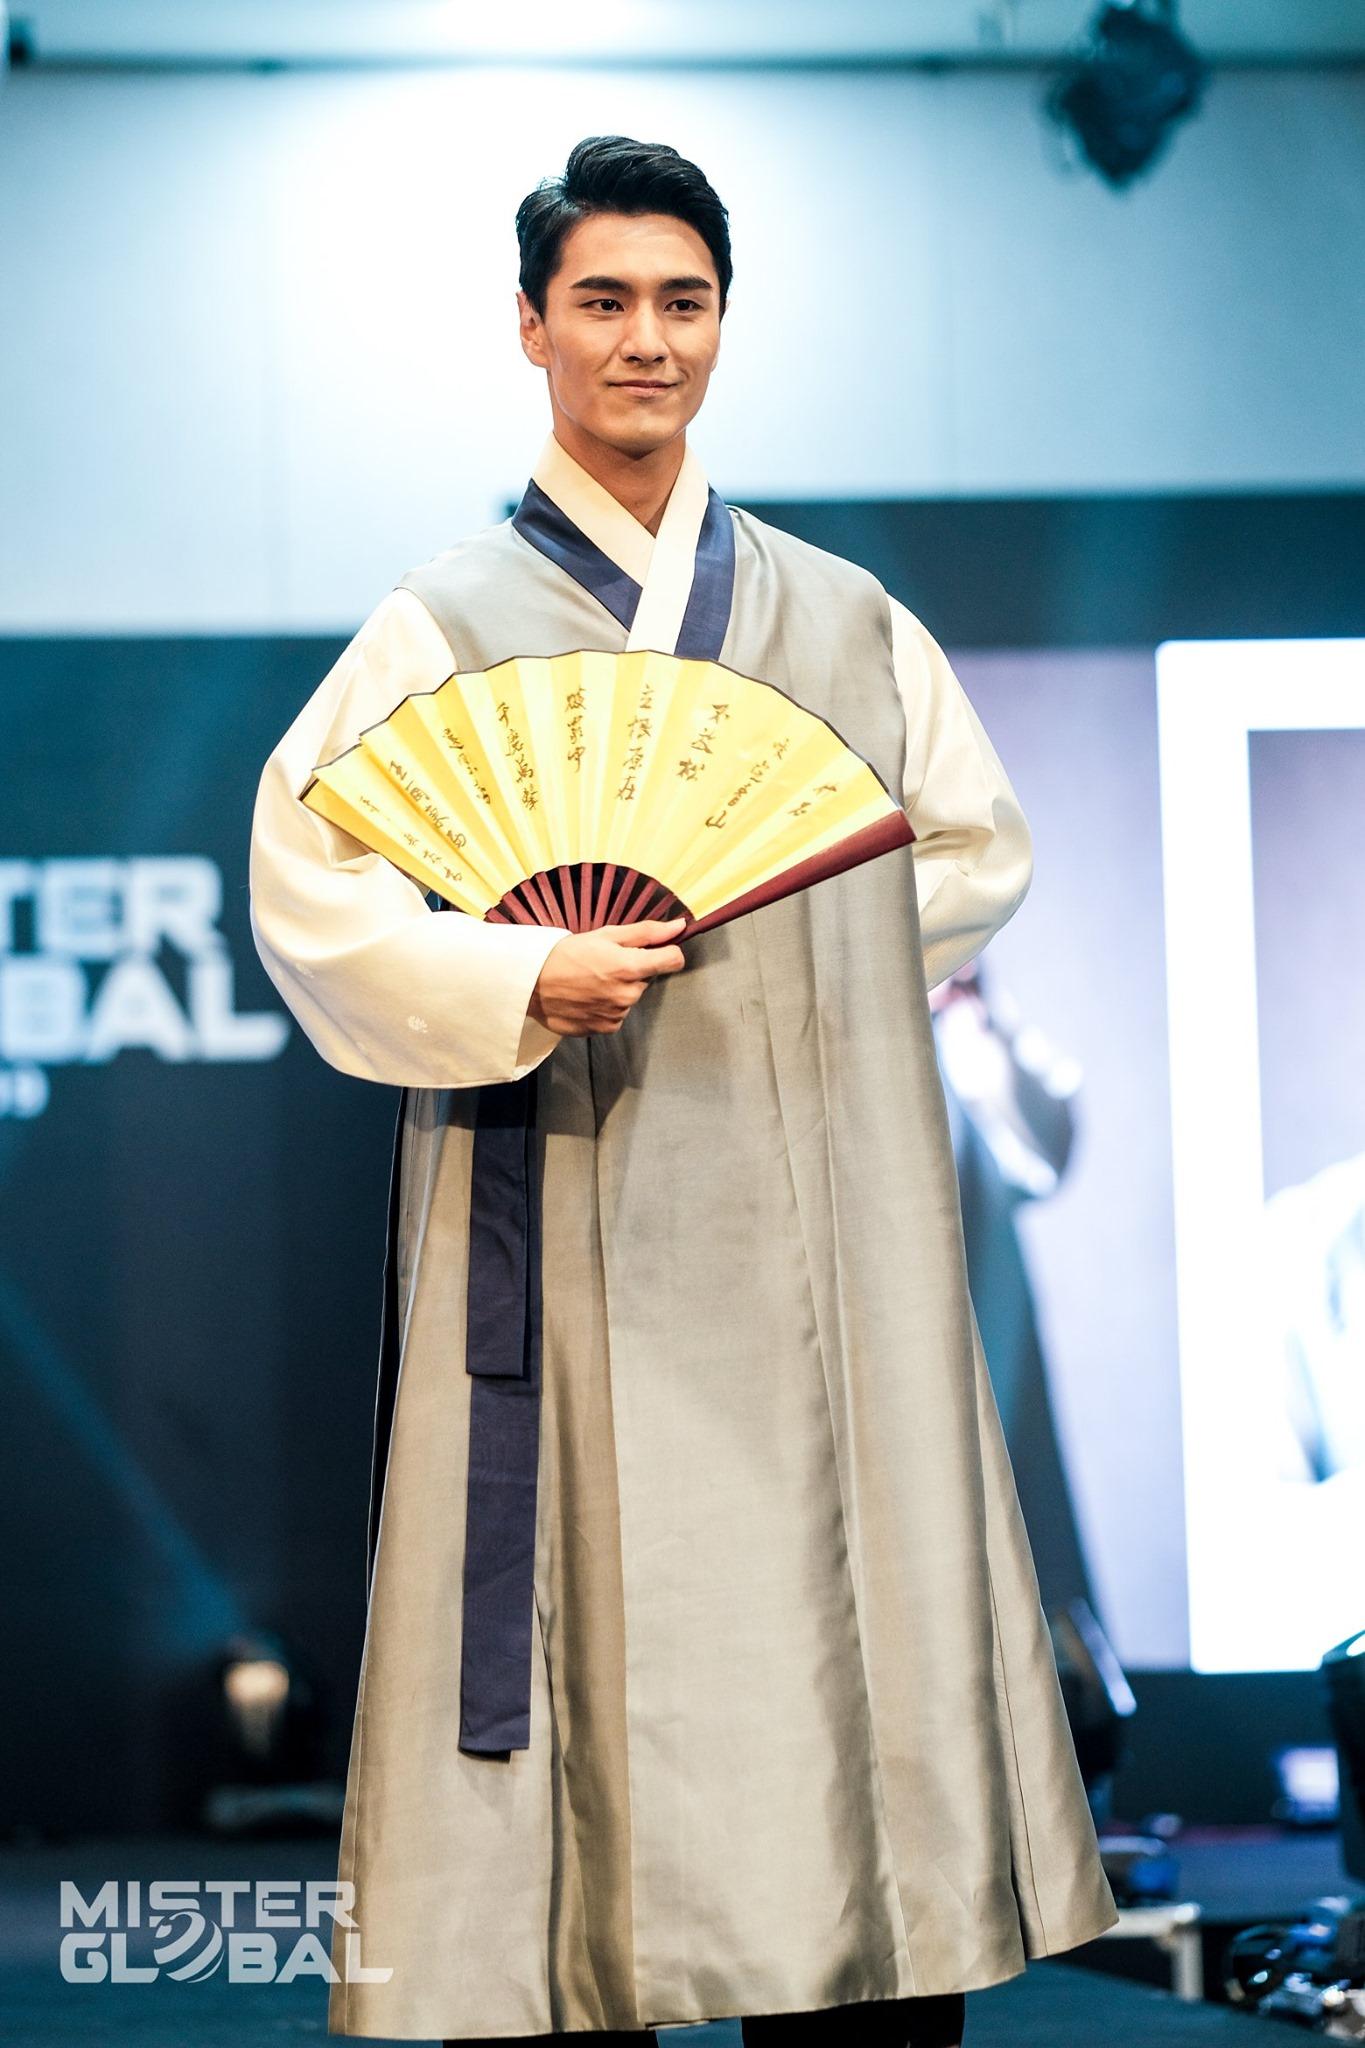 jongwoo kim, mr global 2019. - Página 3 71840210